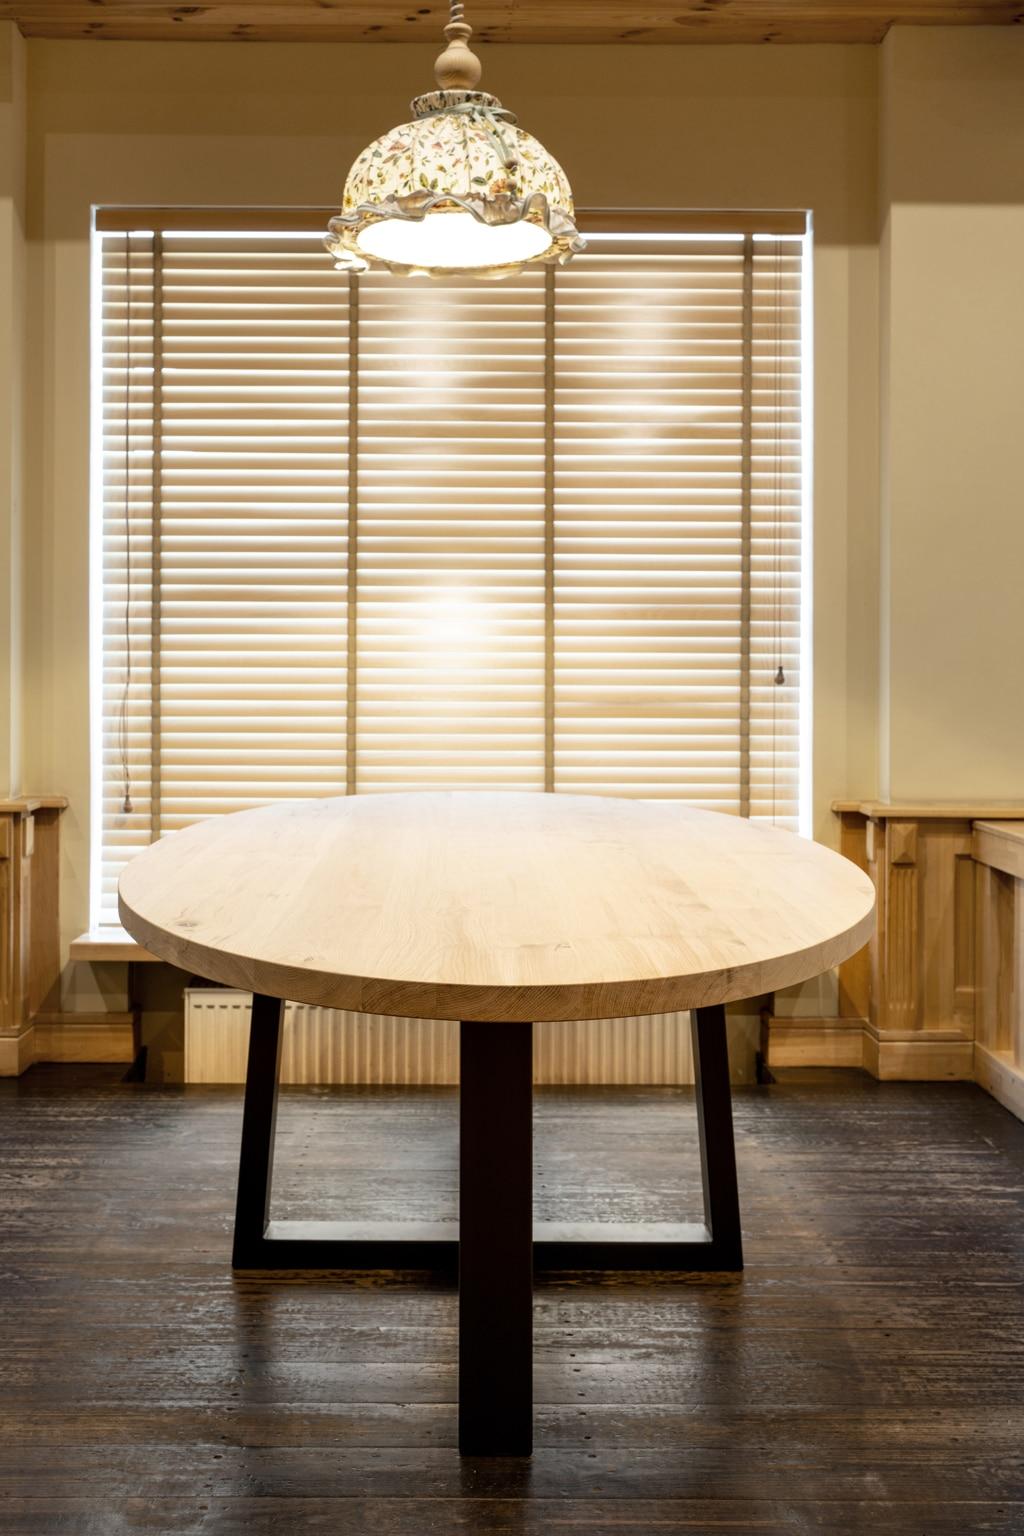 solo mesas redondas